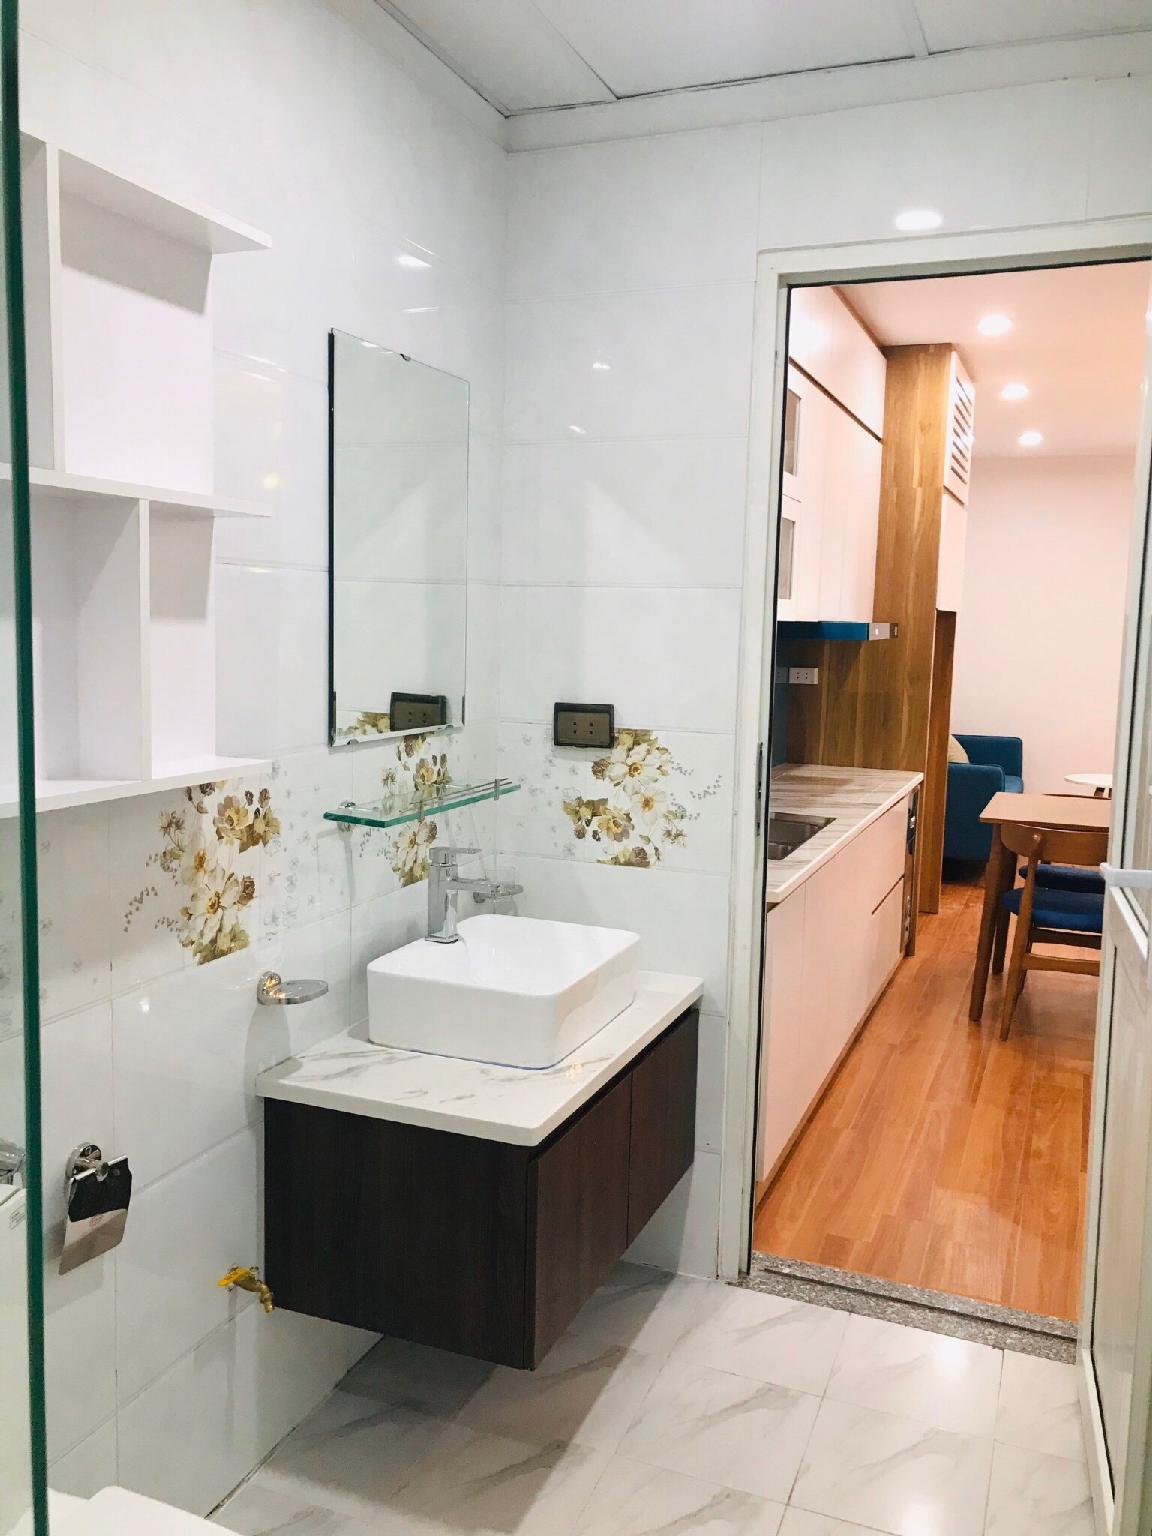 Asahi Luxstay  Uong Bi New City Apartment